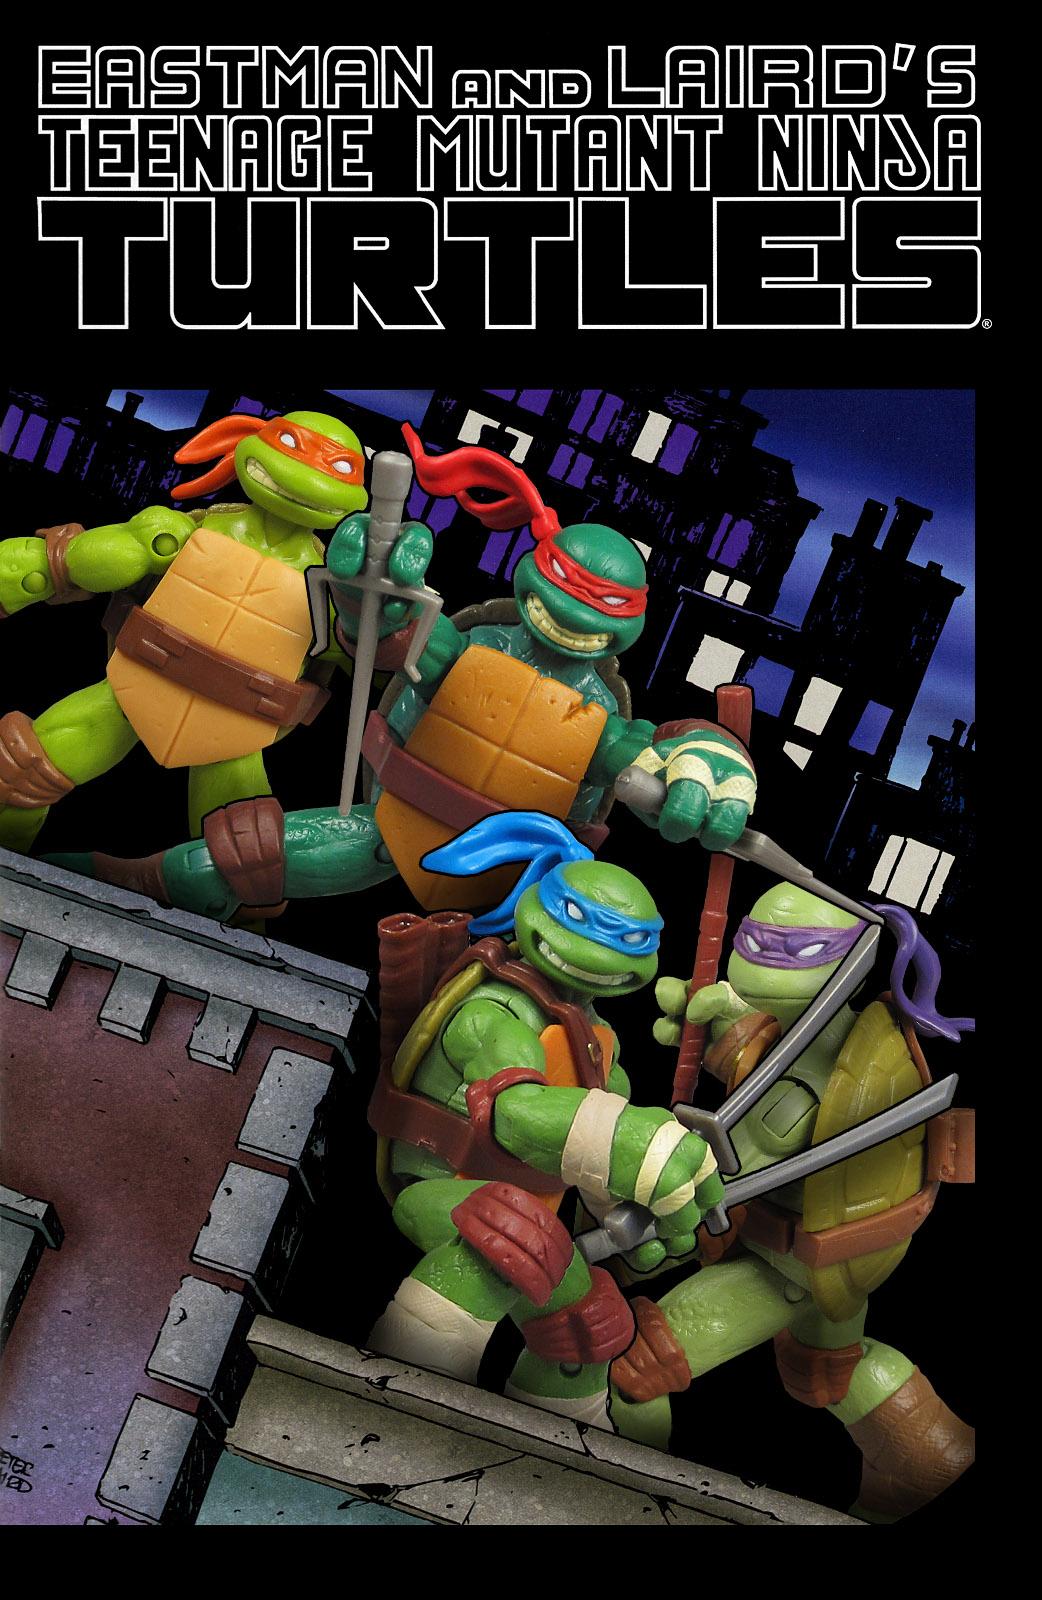 Dork Dimension: Toy Review: Teenage Mutant Ninja Turtles ...Nickelodeon Ninja Turtles Toys